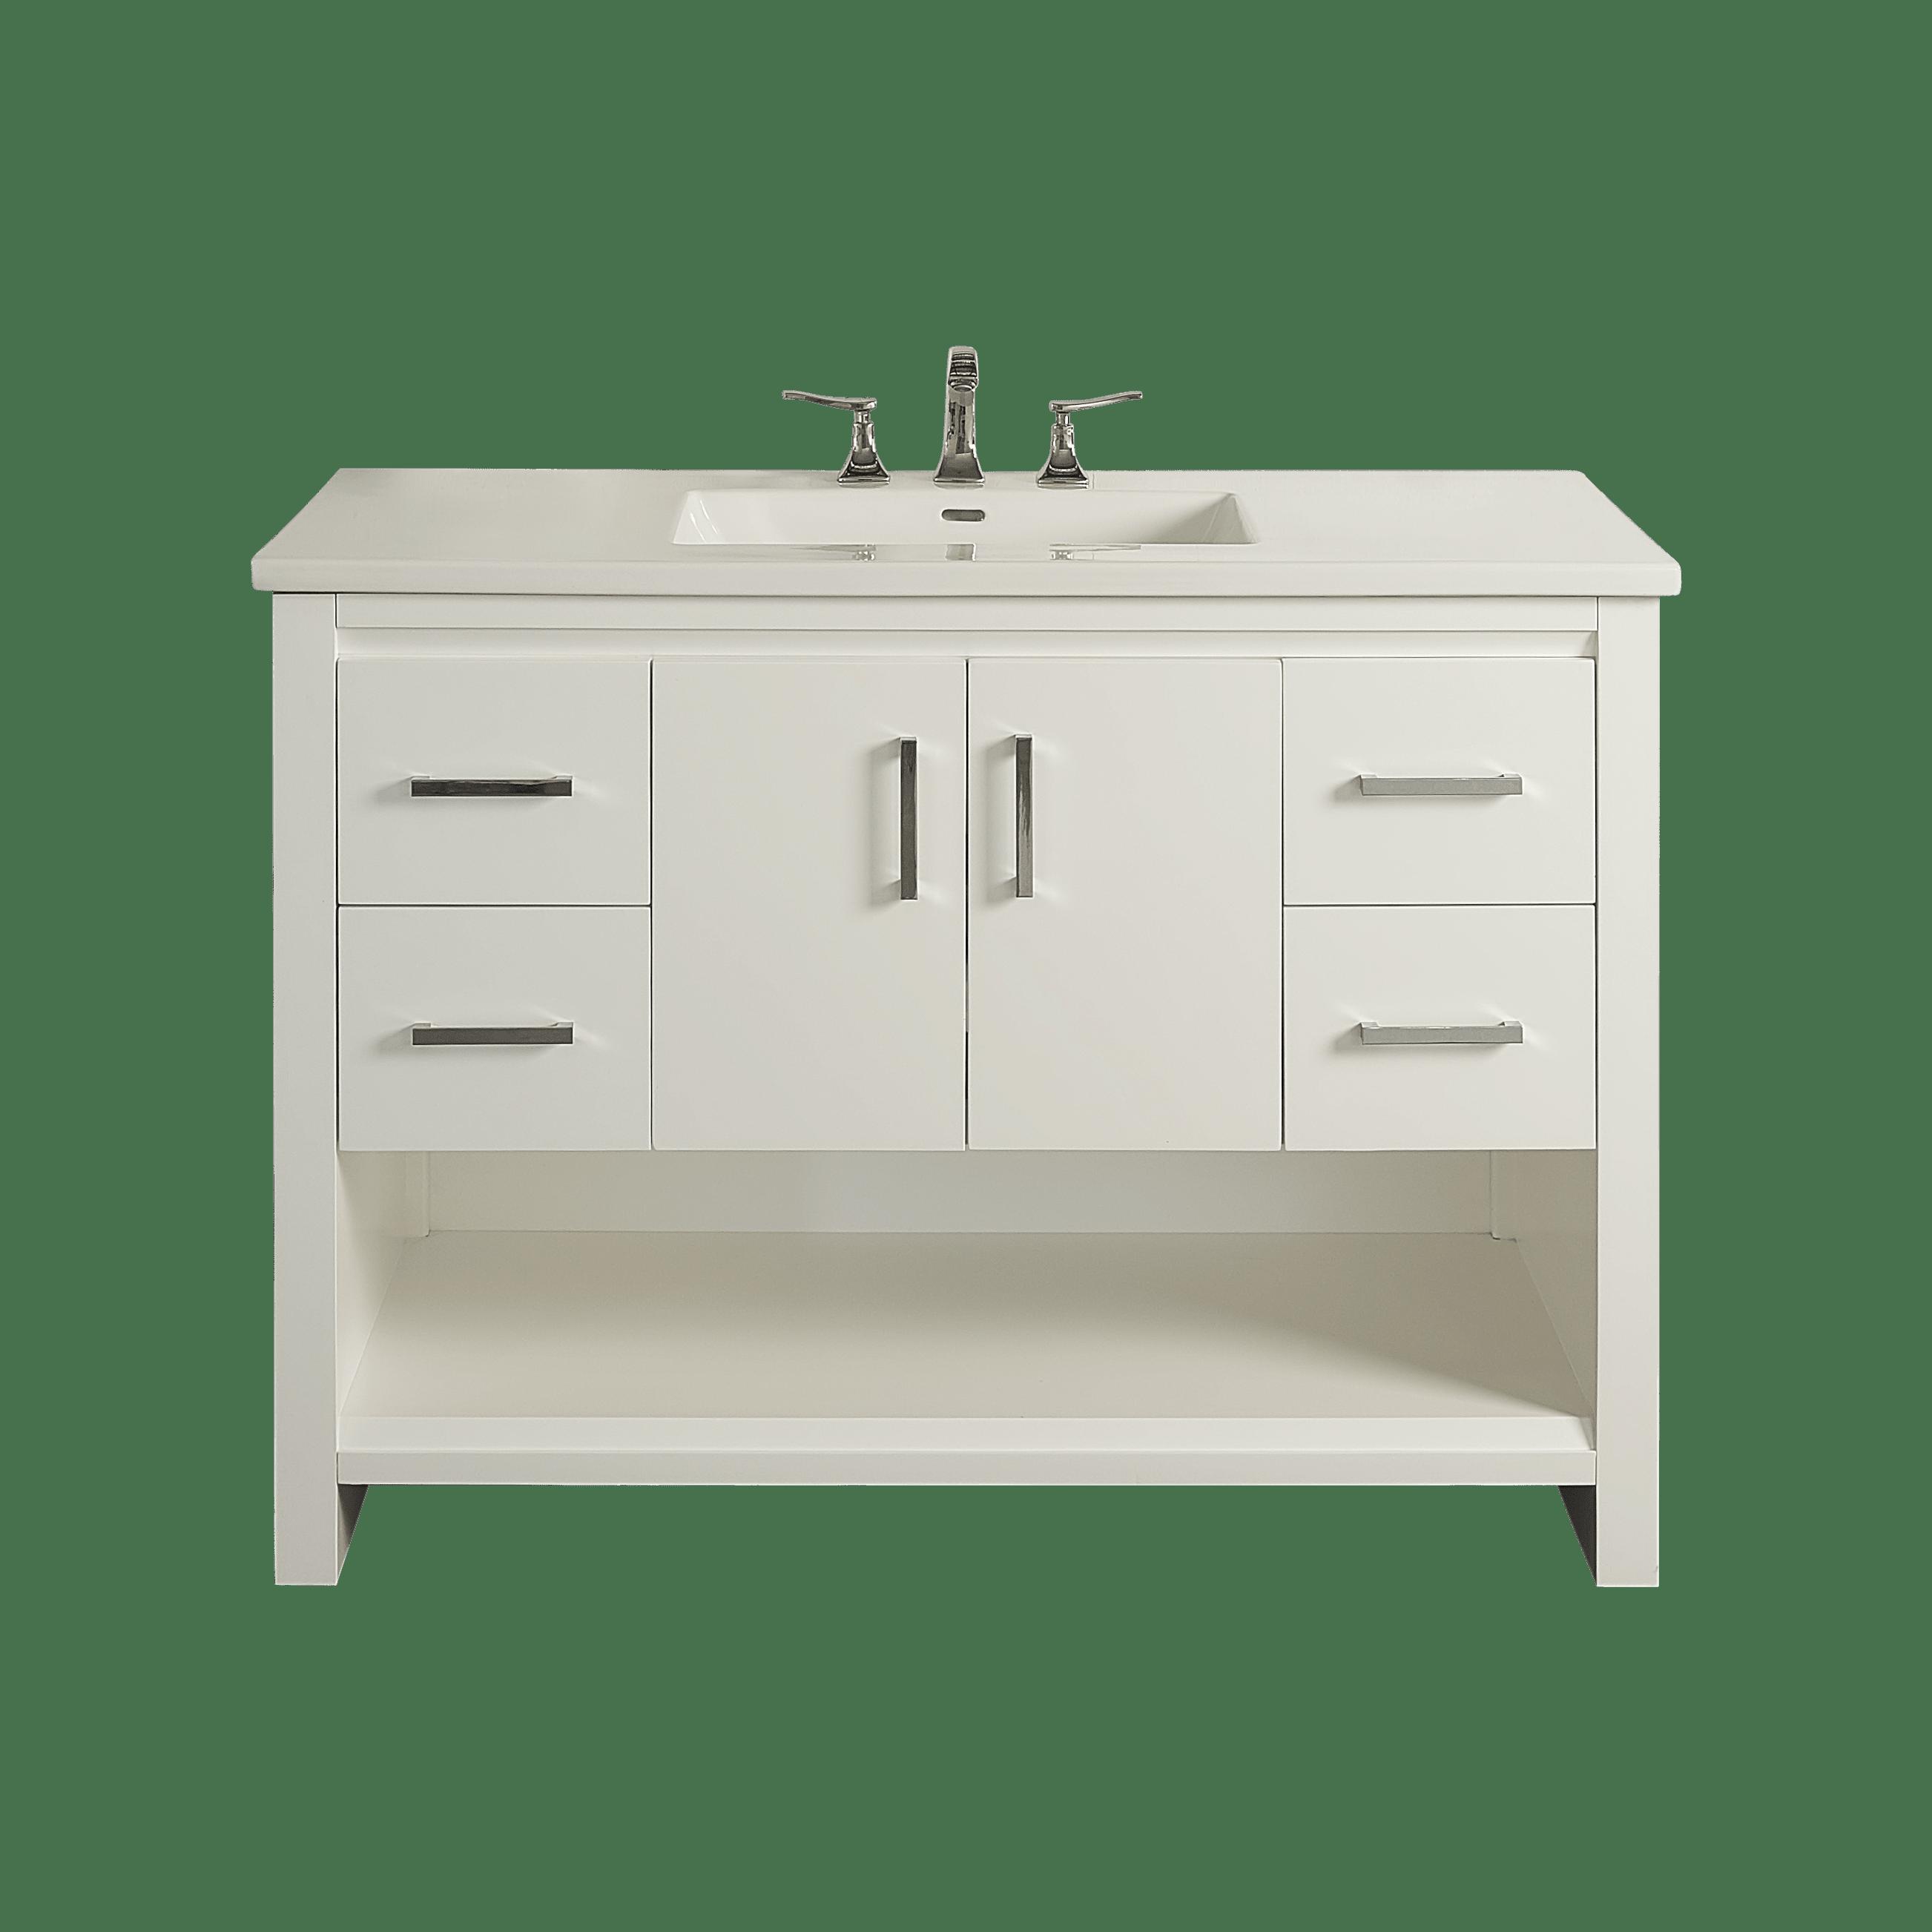 Fairmont Designs 1517-V48 Studio One Bathroom Vanity   QualityBath.com